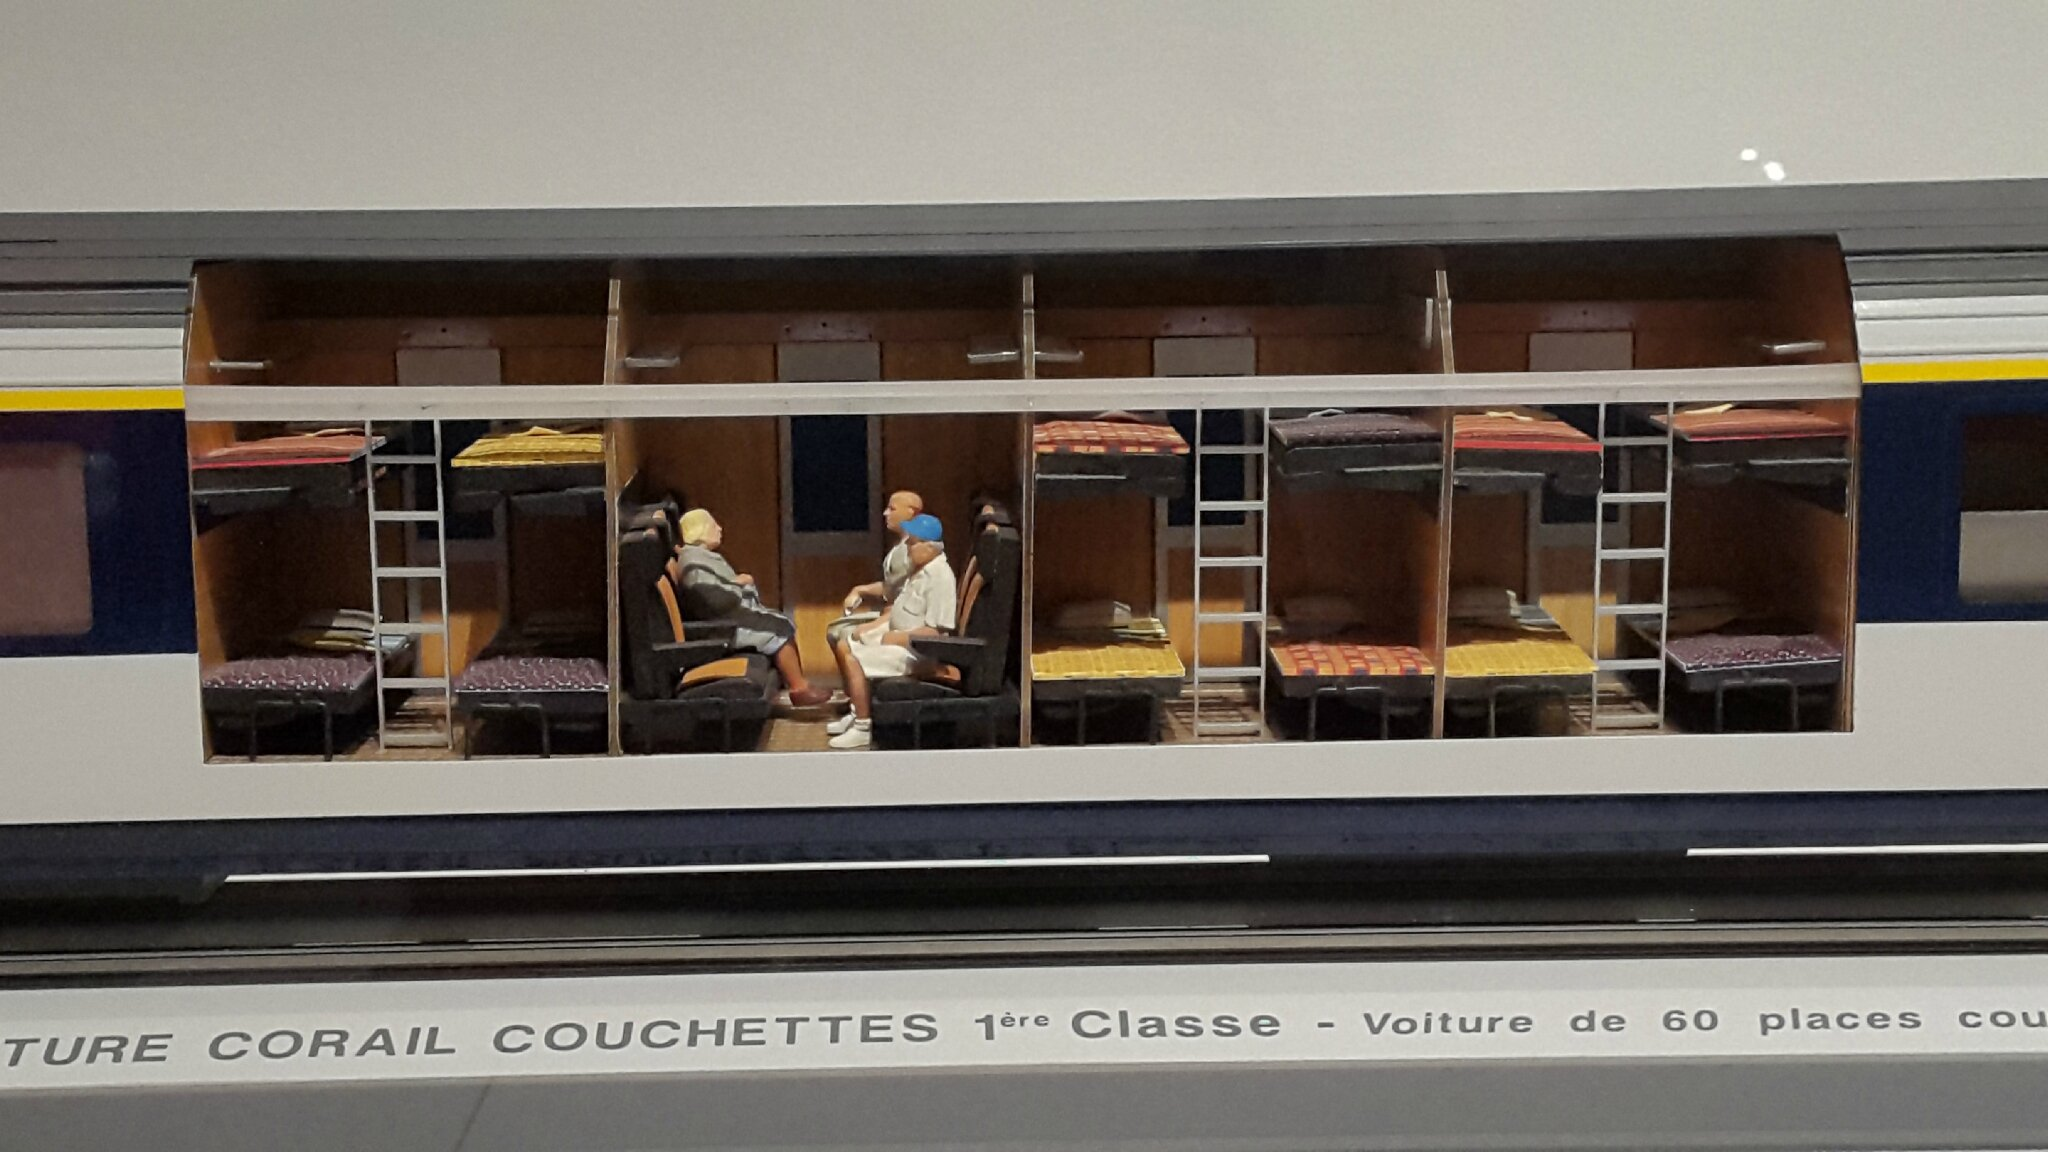 Maquette Voiture 1e classe couchettes Corail